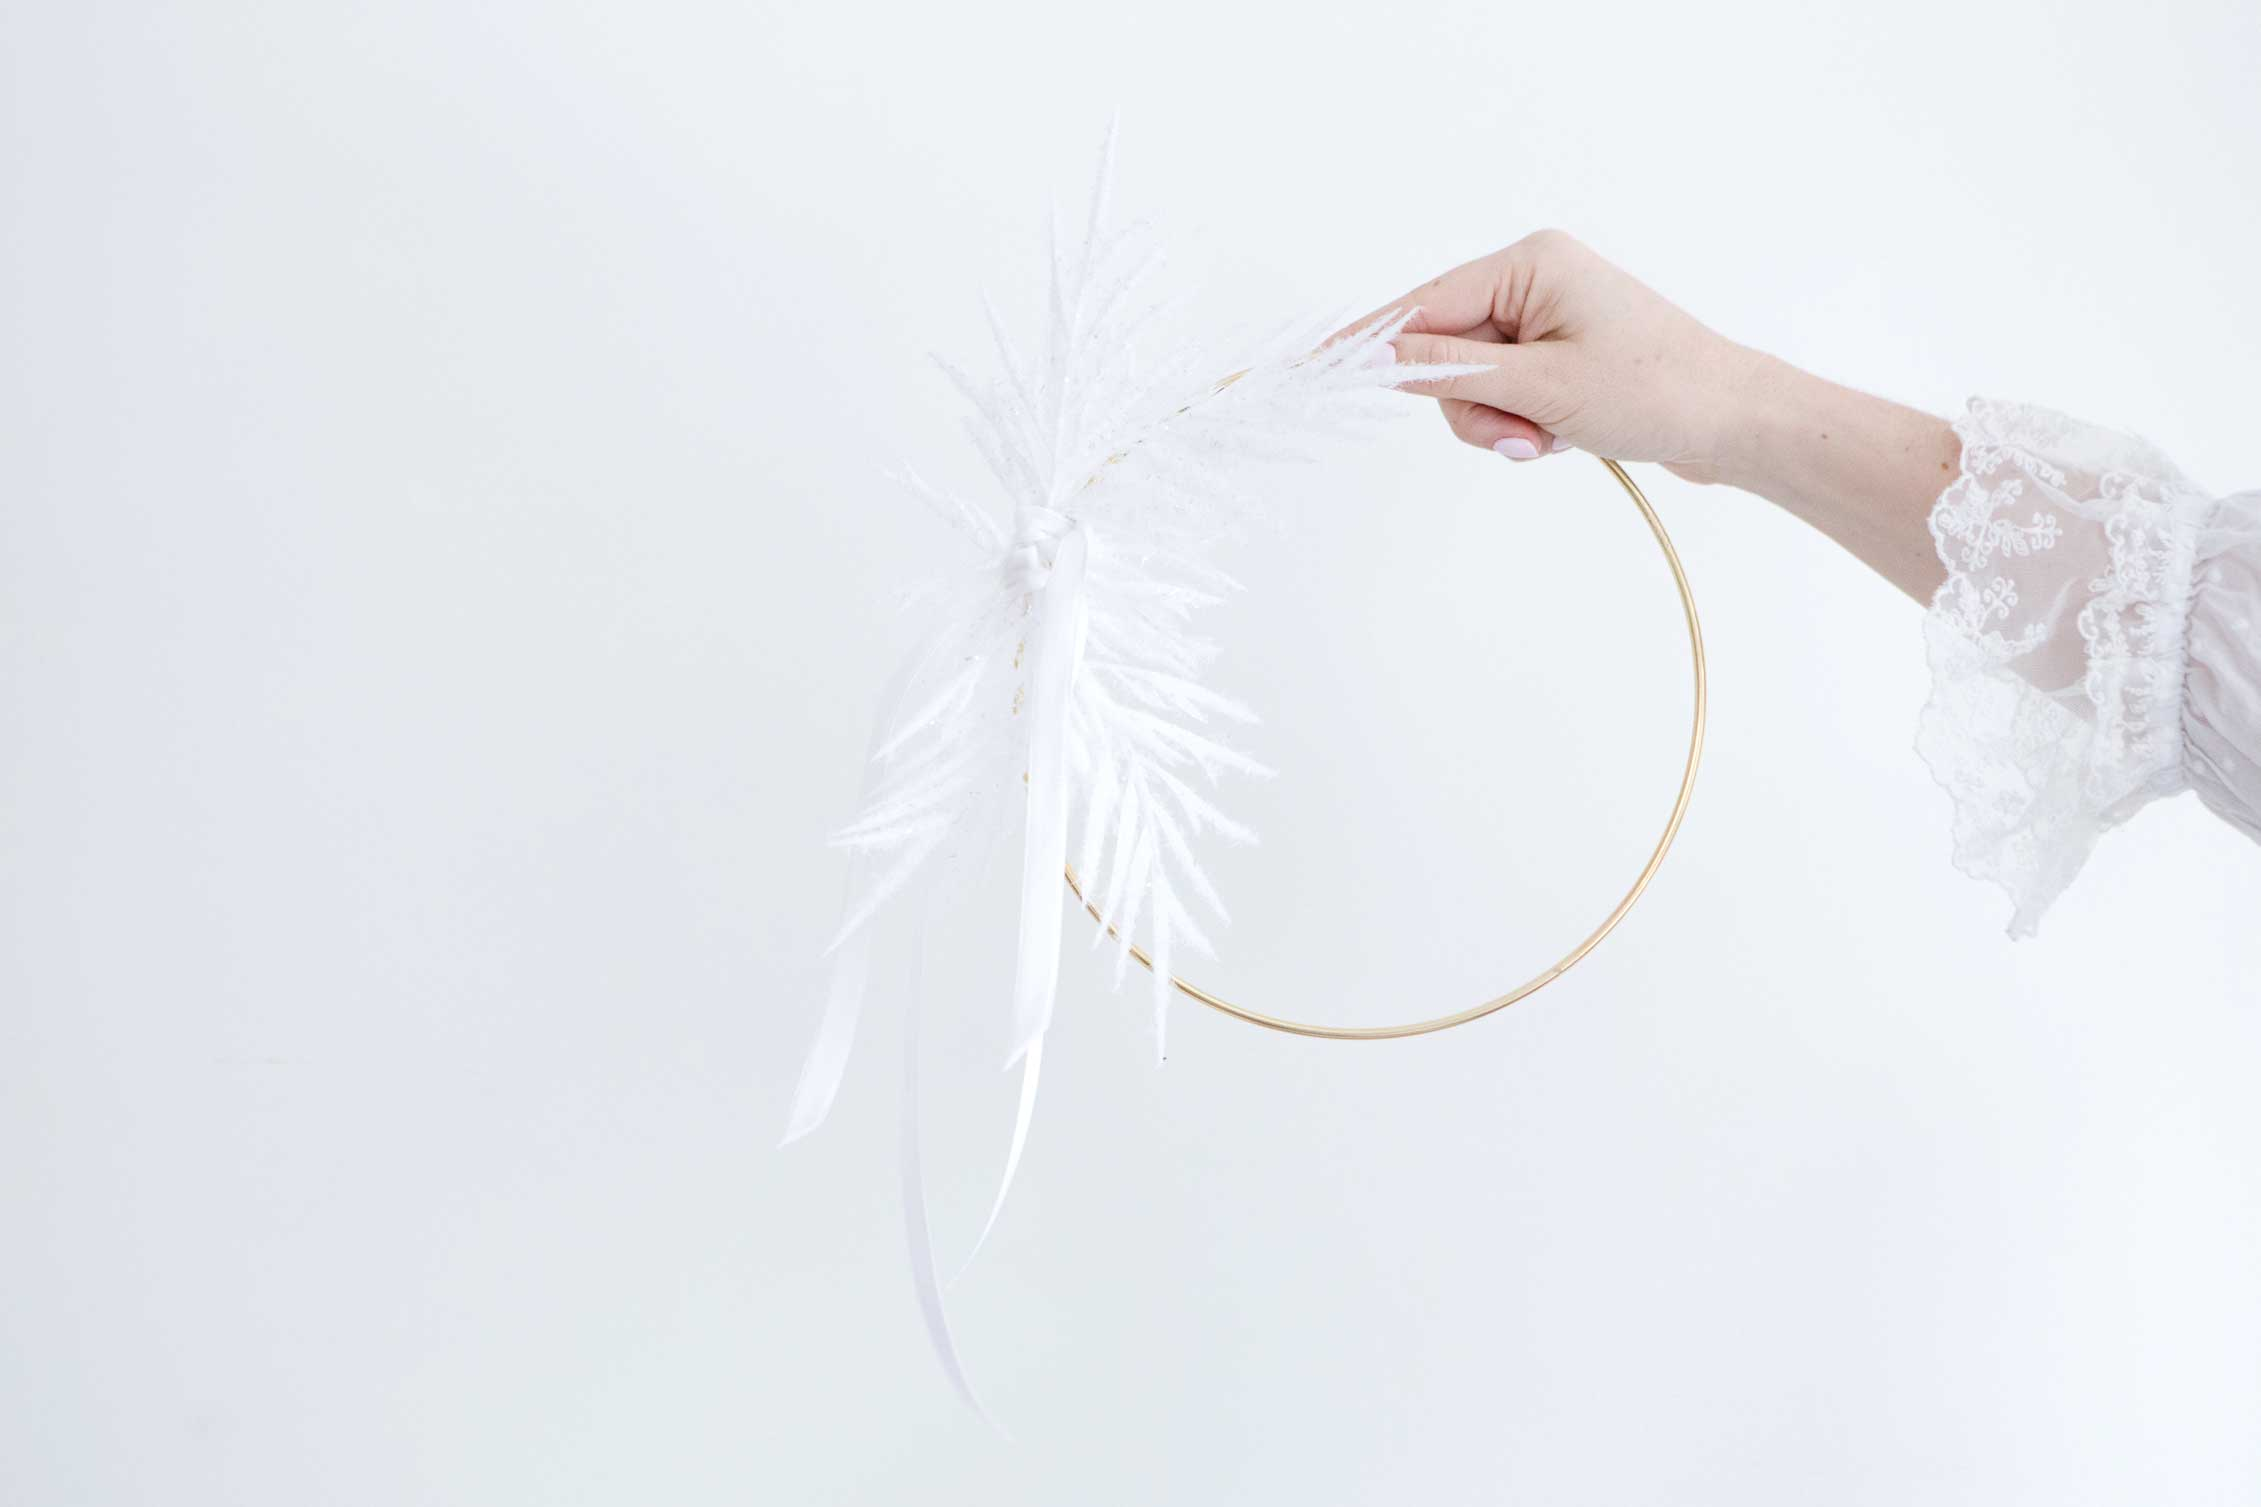 StudioBicyclette_ModernMinimalWreath-19.jpg